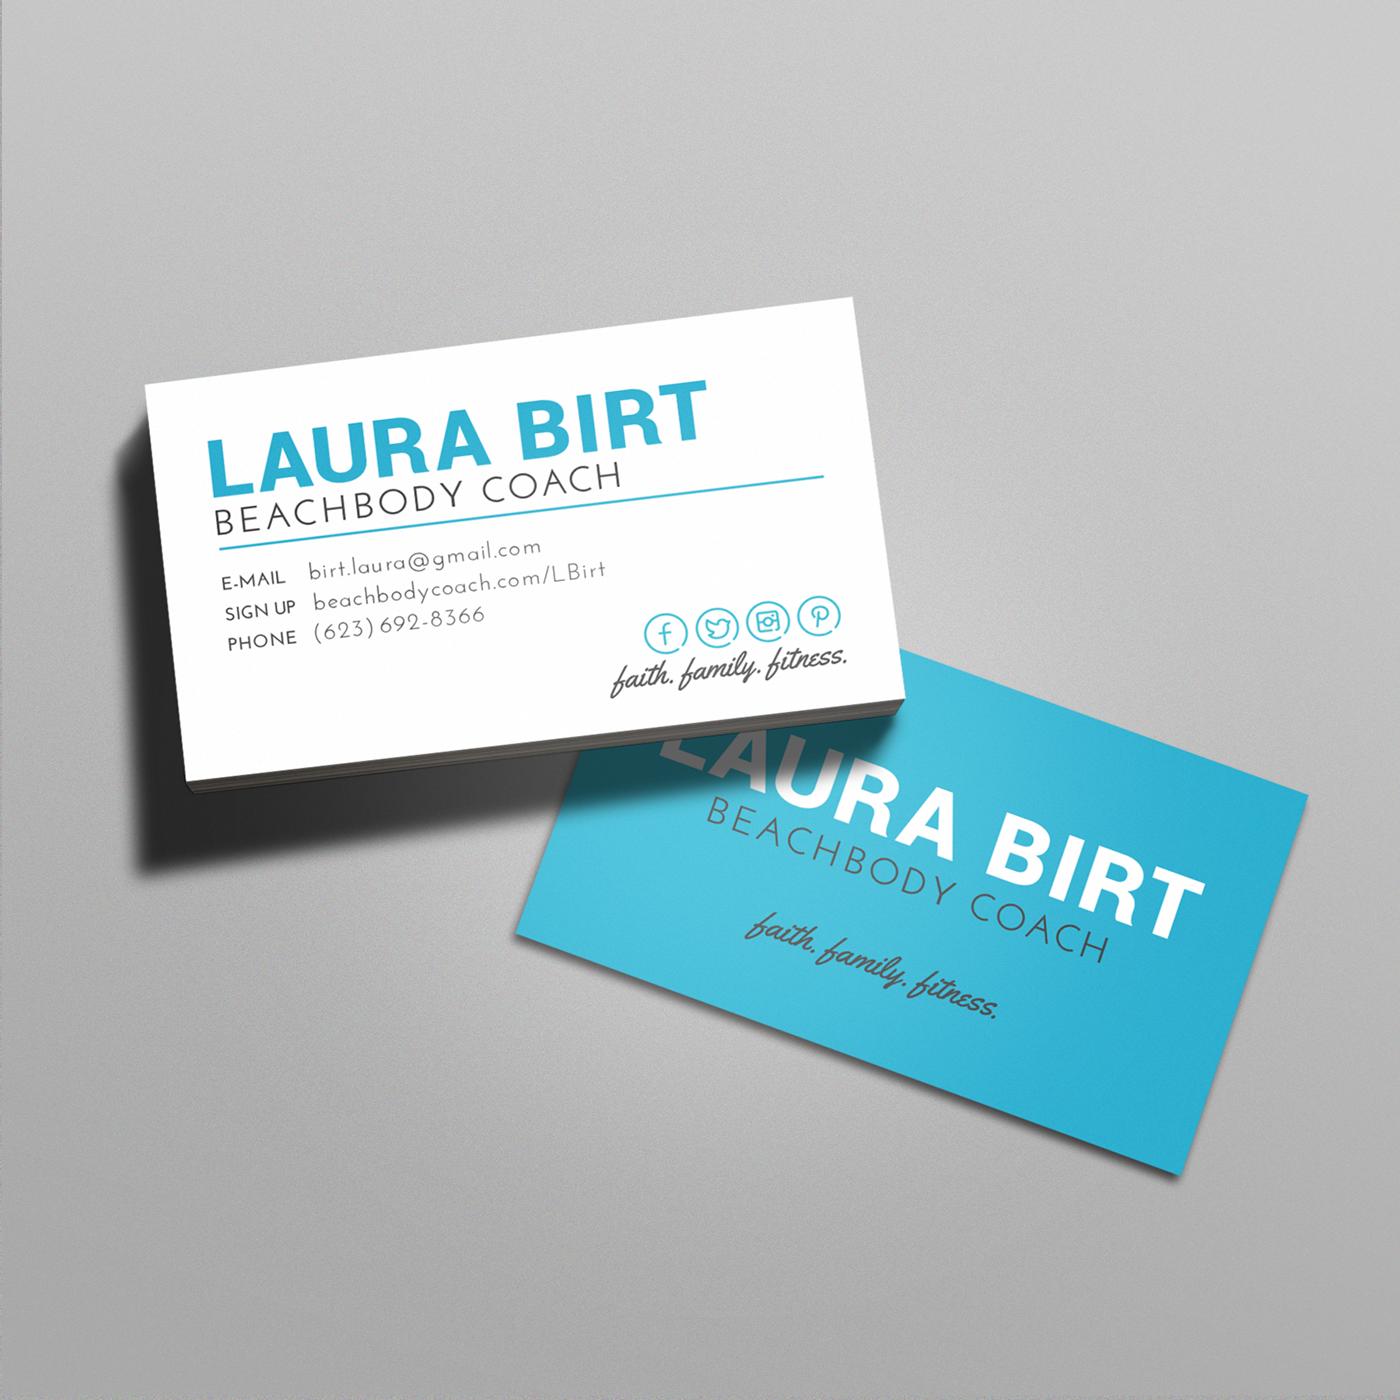 Beachbody Business CardsAlexabusinesscardprinting